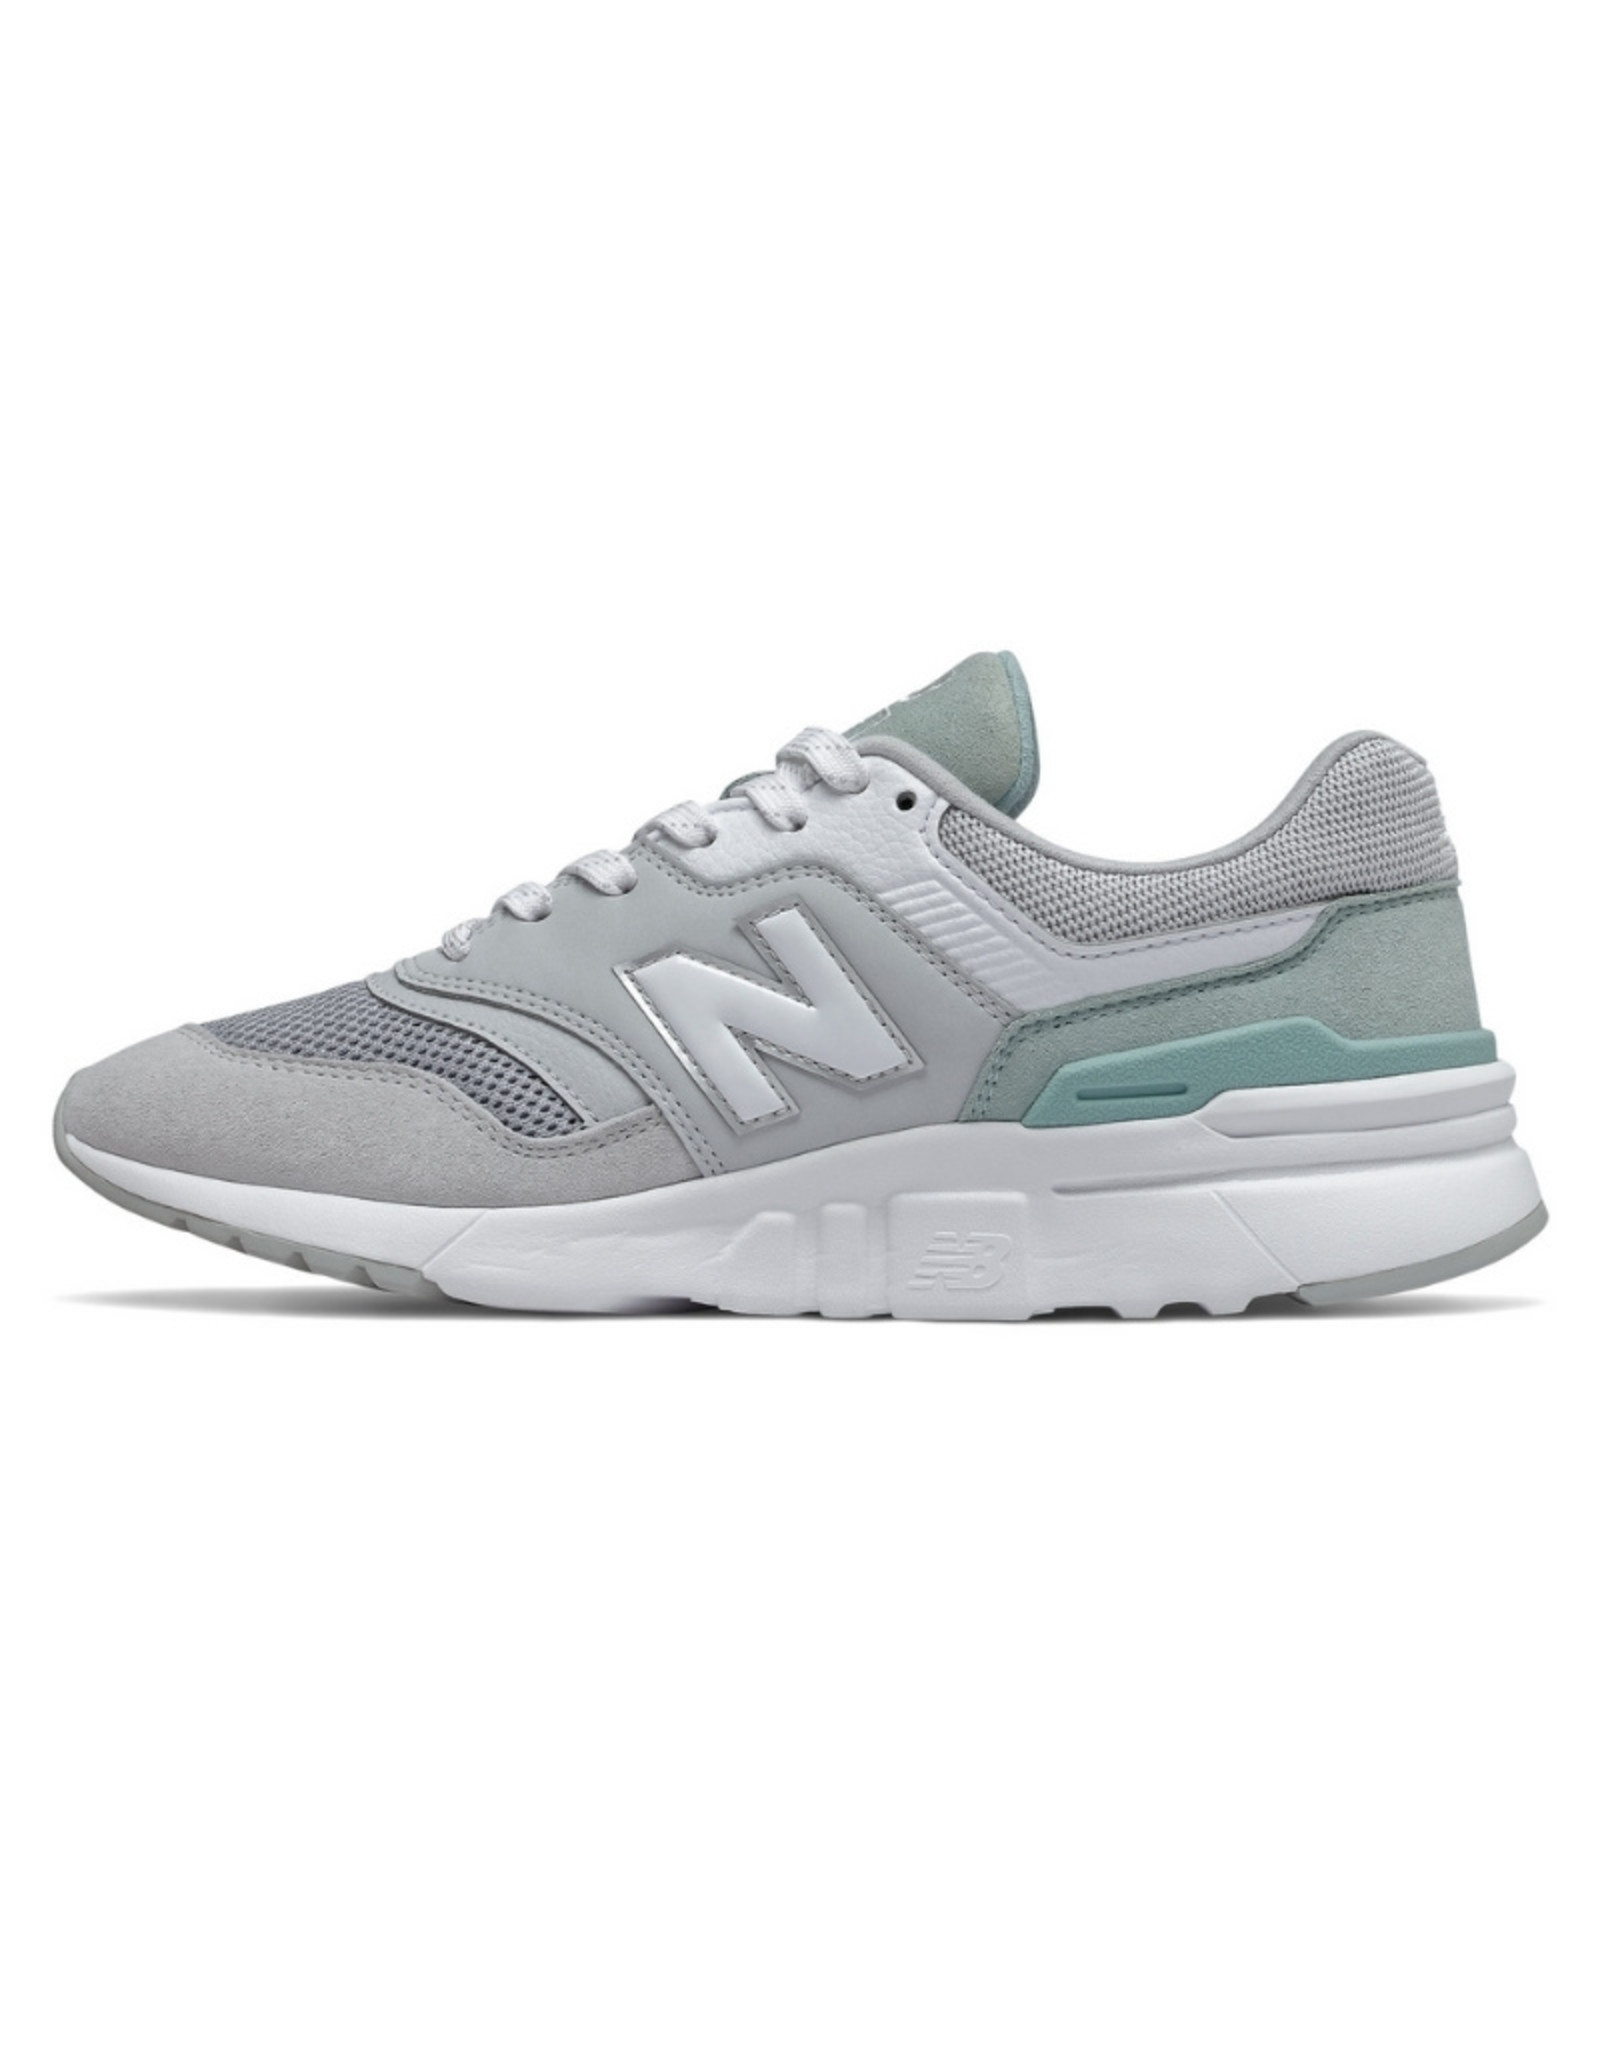 New Balance - CW997HBT